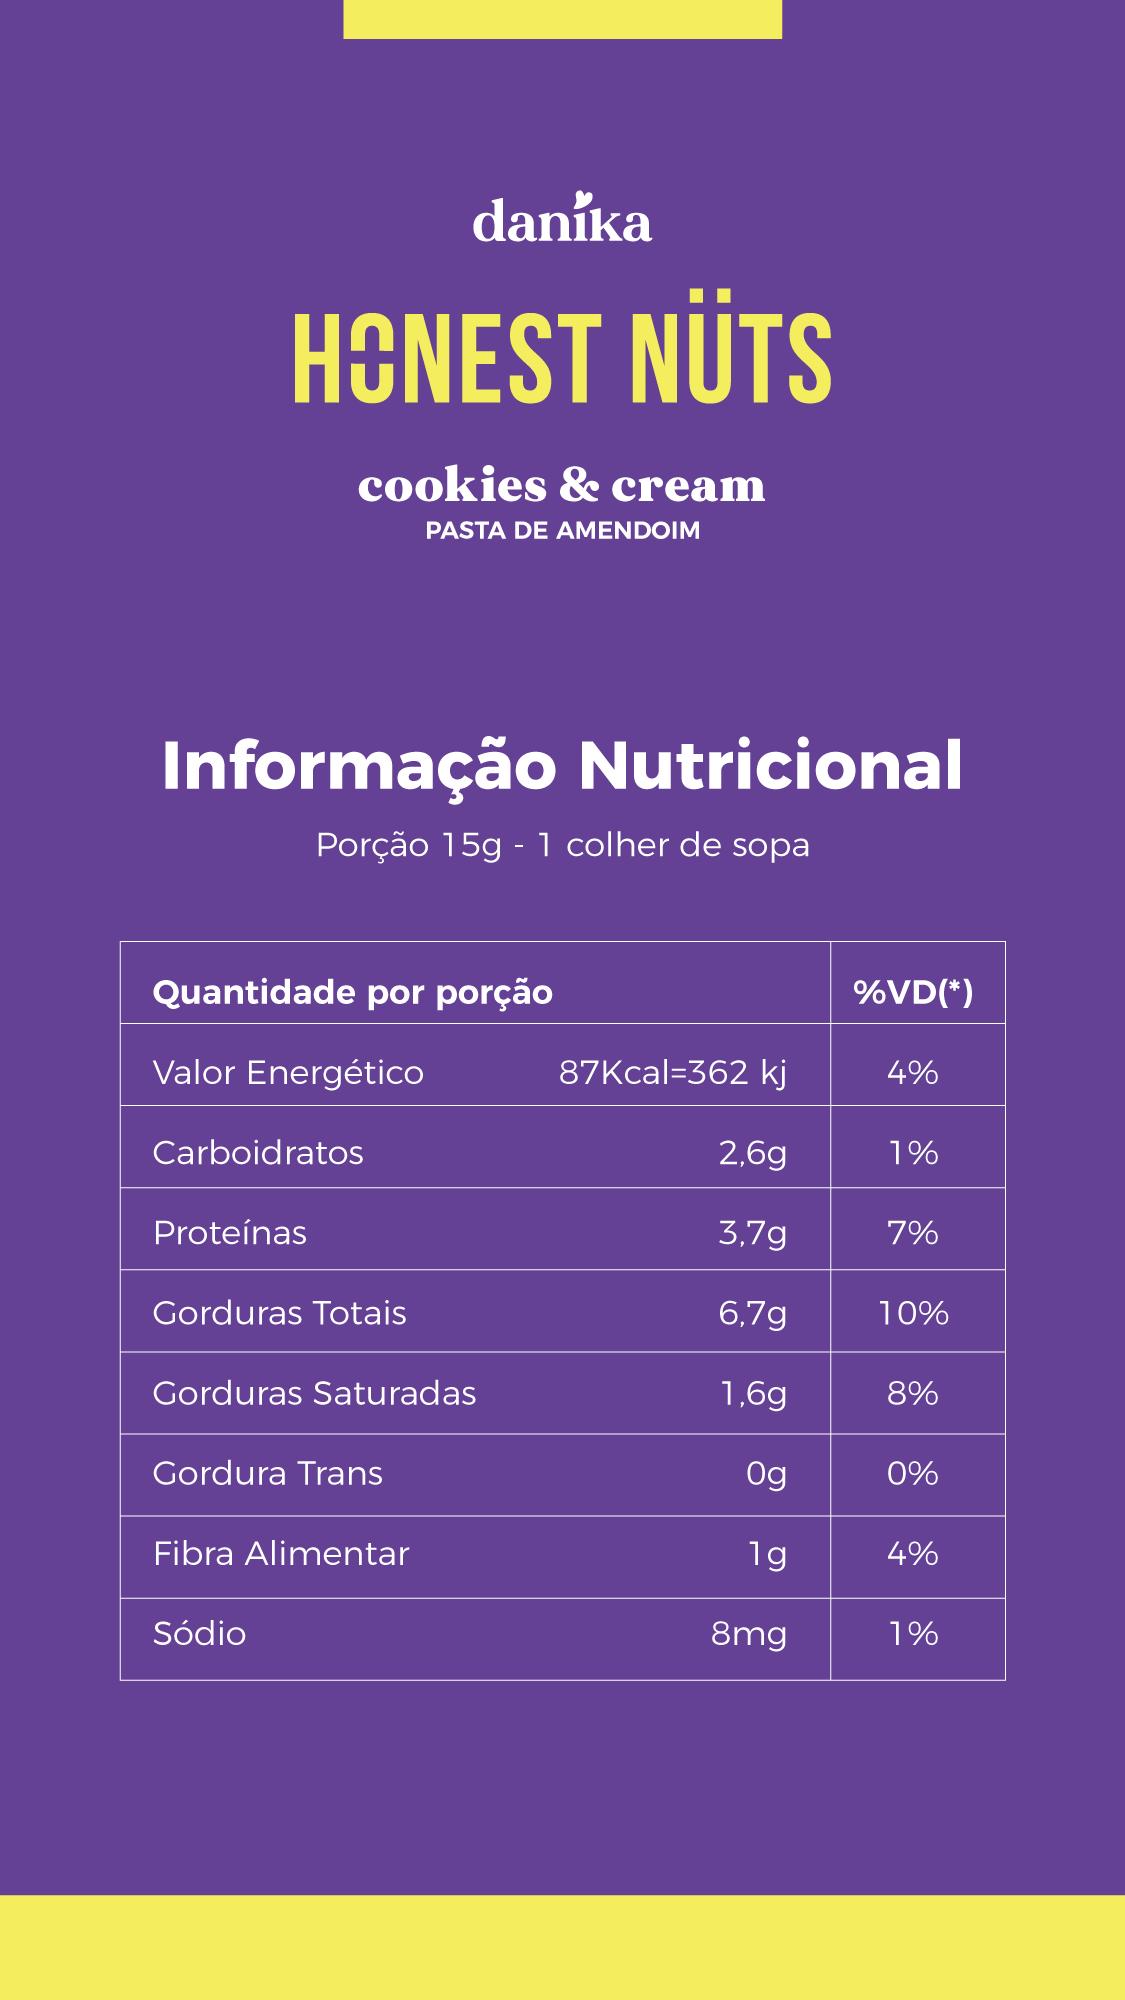 Cookies & Cream (220g)  - Honest Nuts